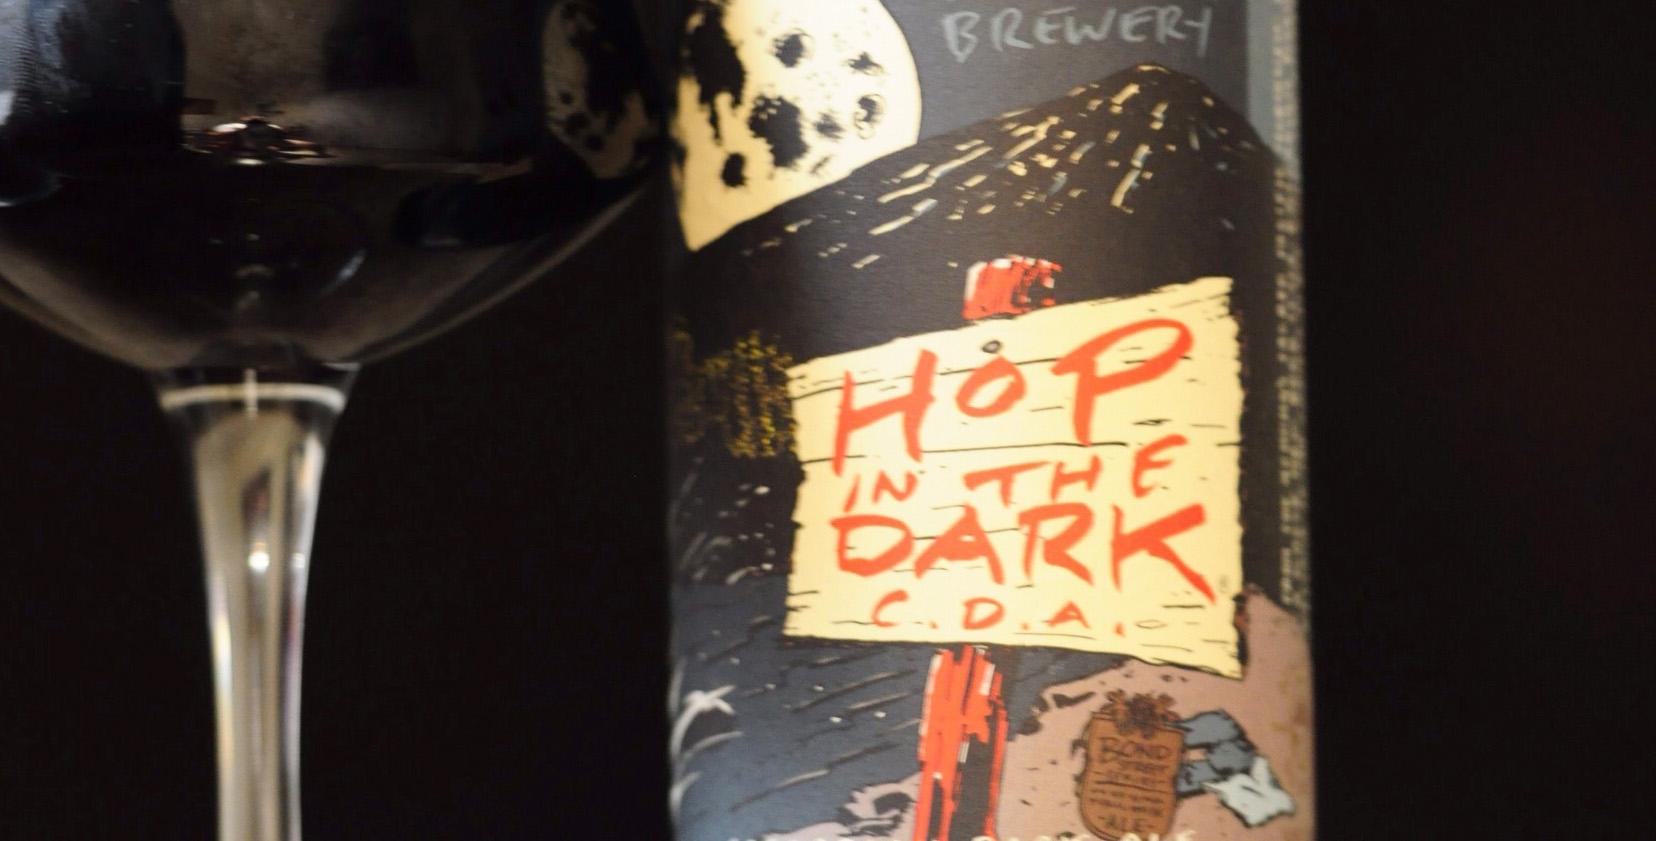 Hop in the Dark